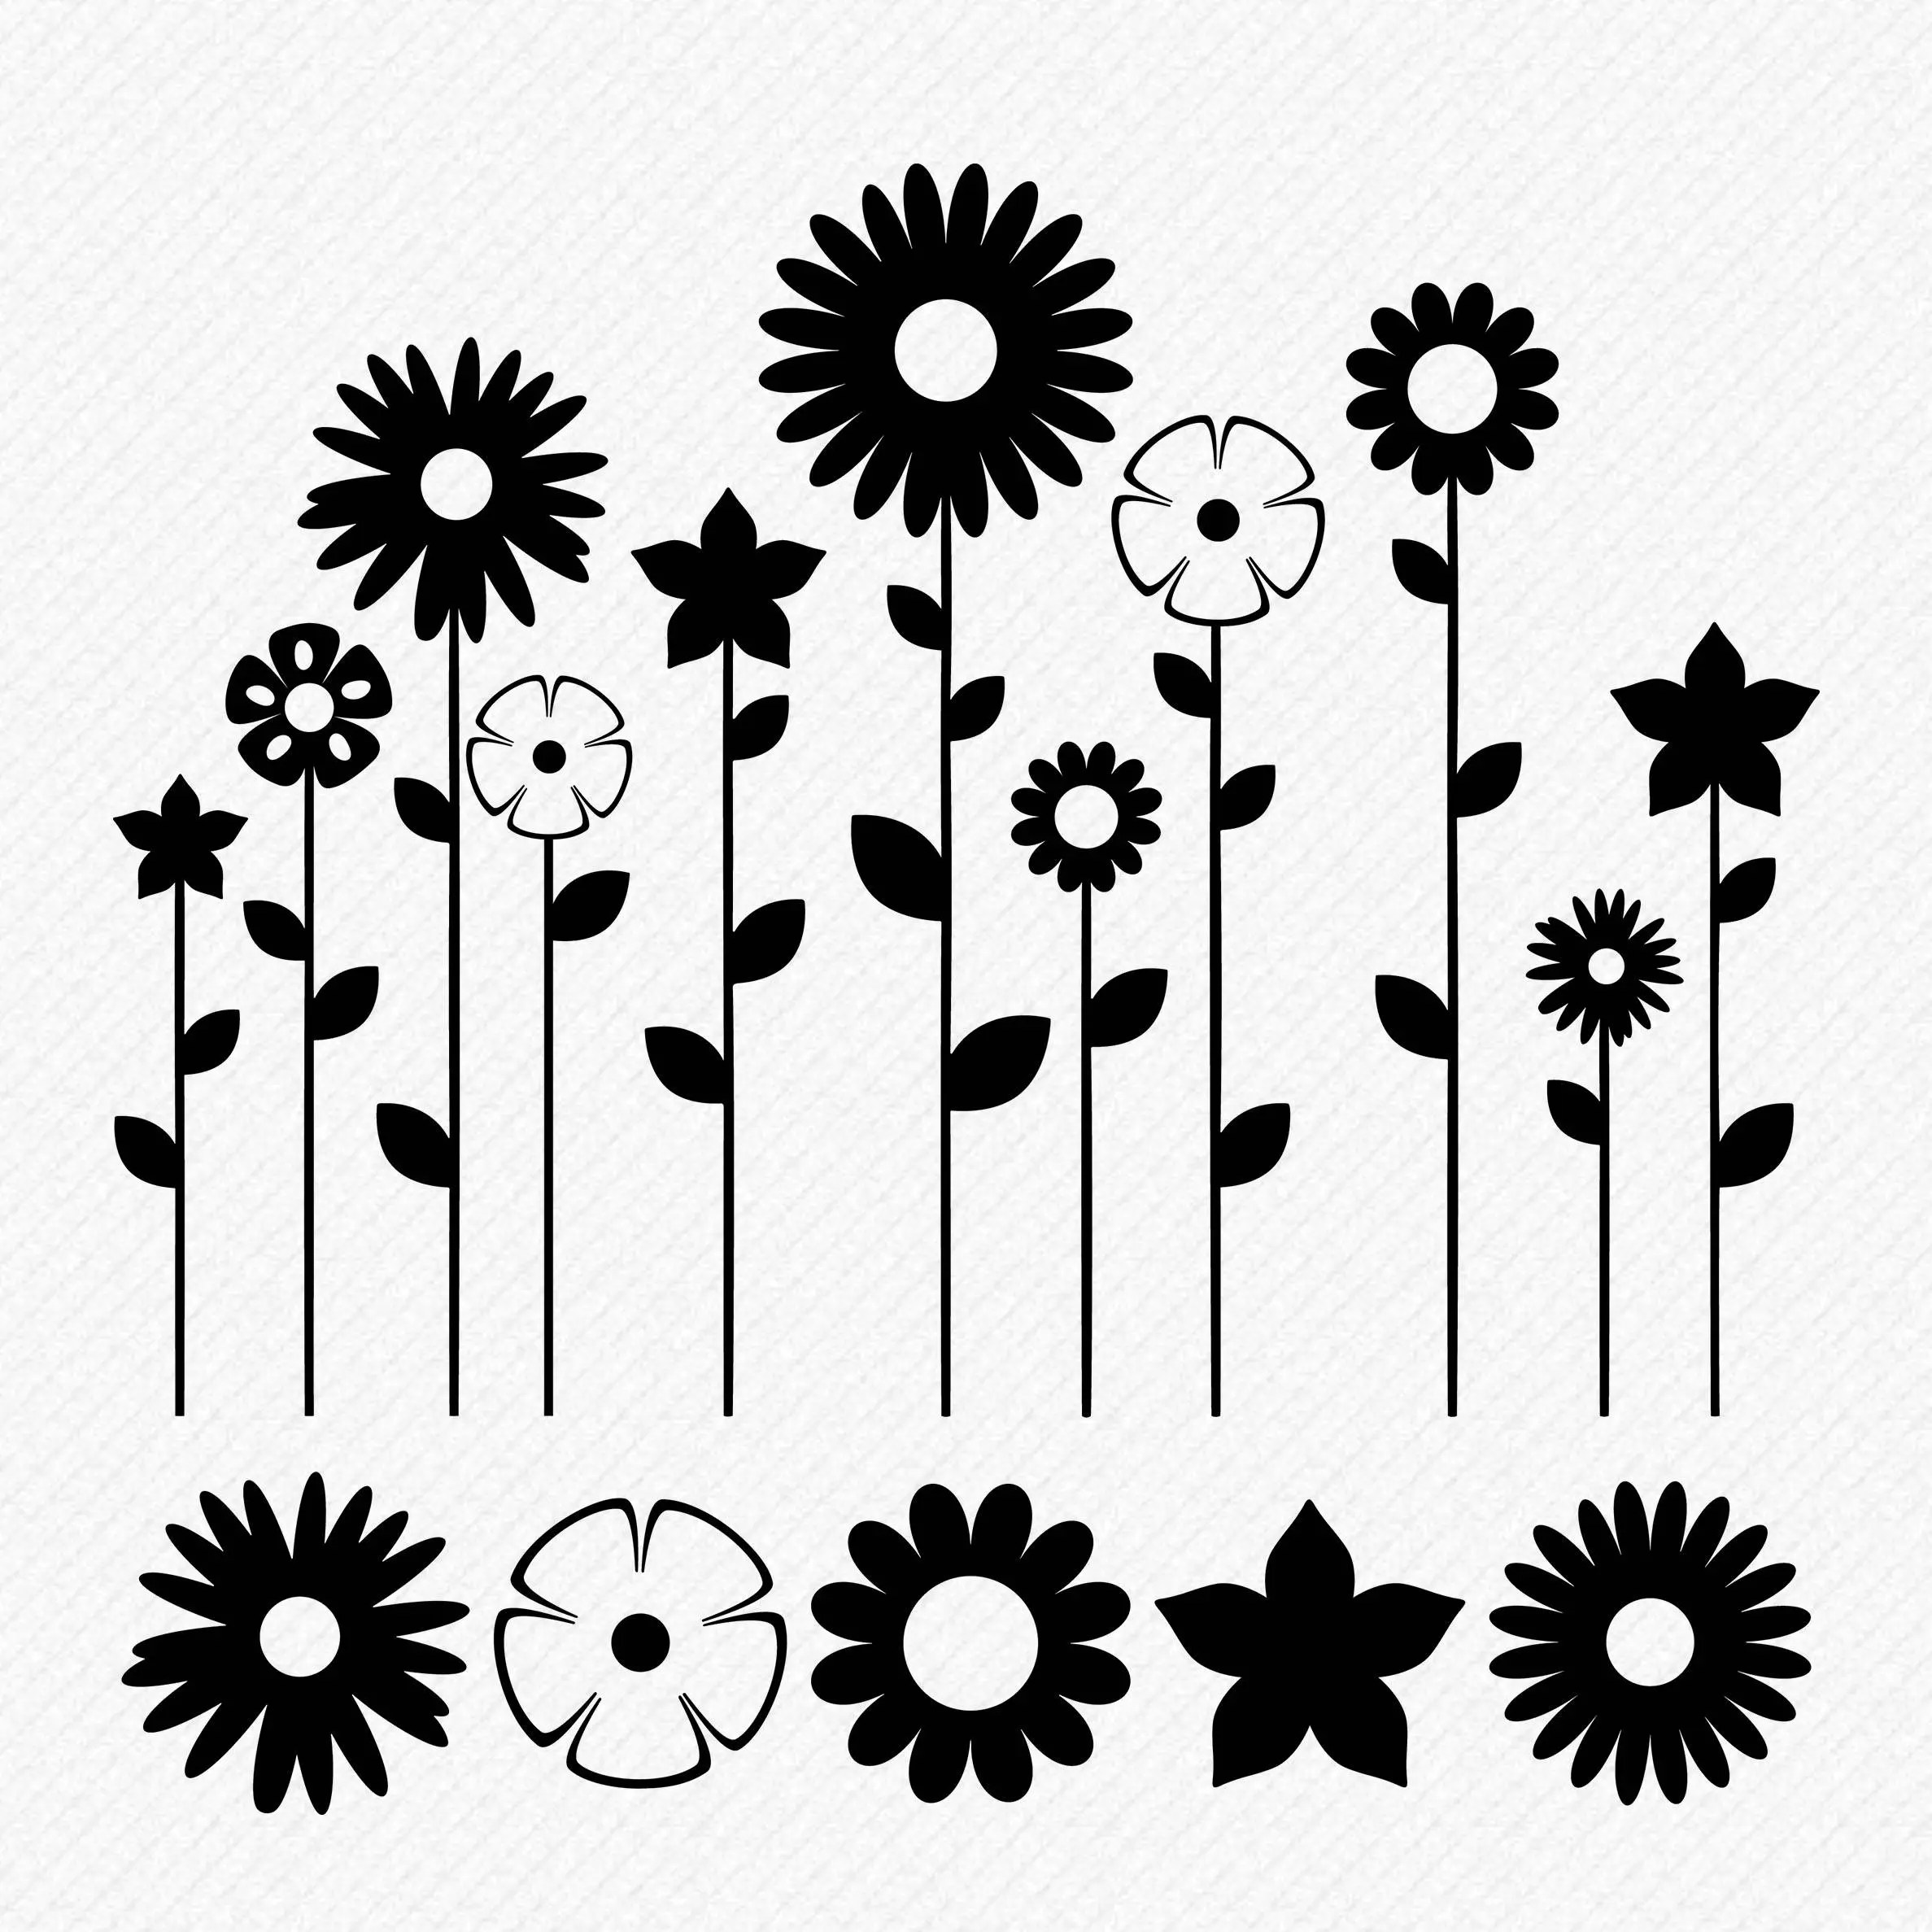 Svg Flowers Svg Floral Svg Flower Garden Cricut Silhouette